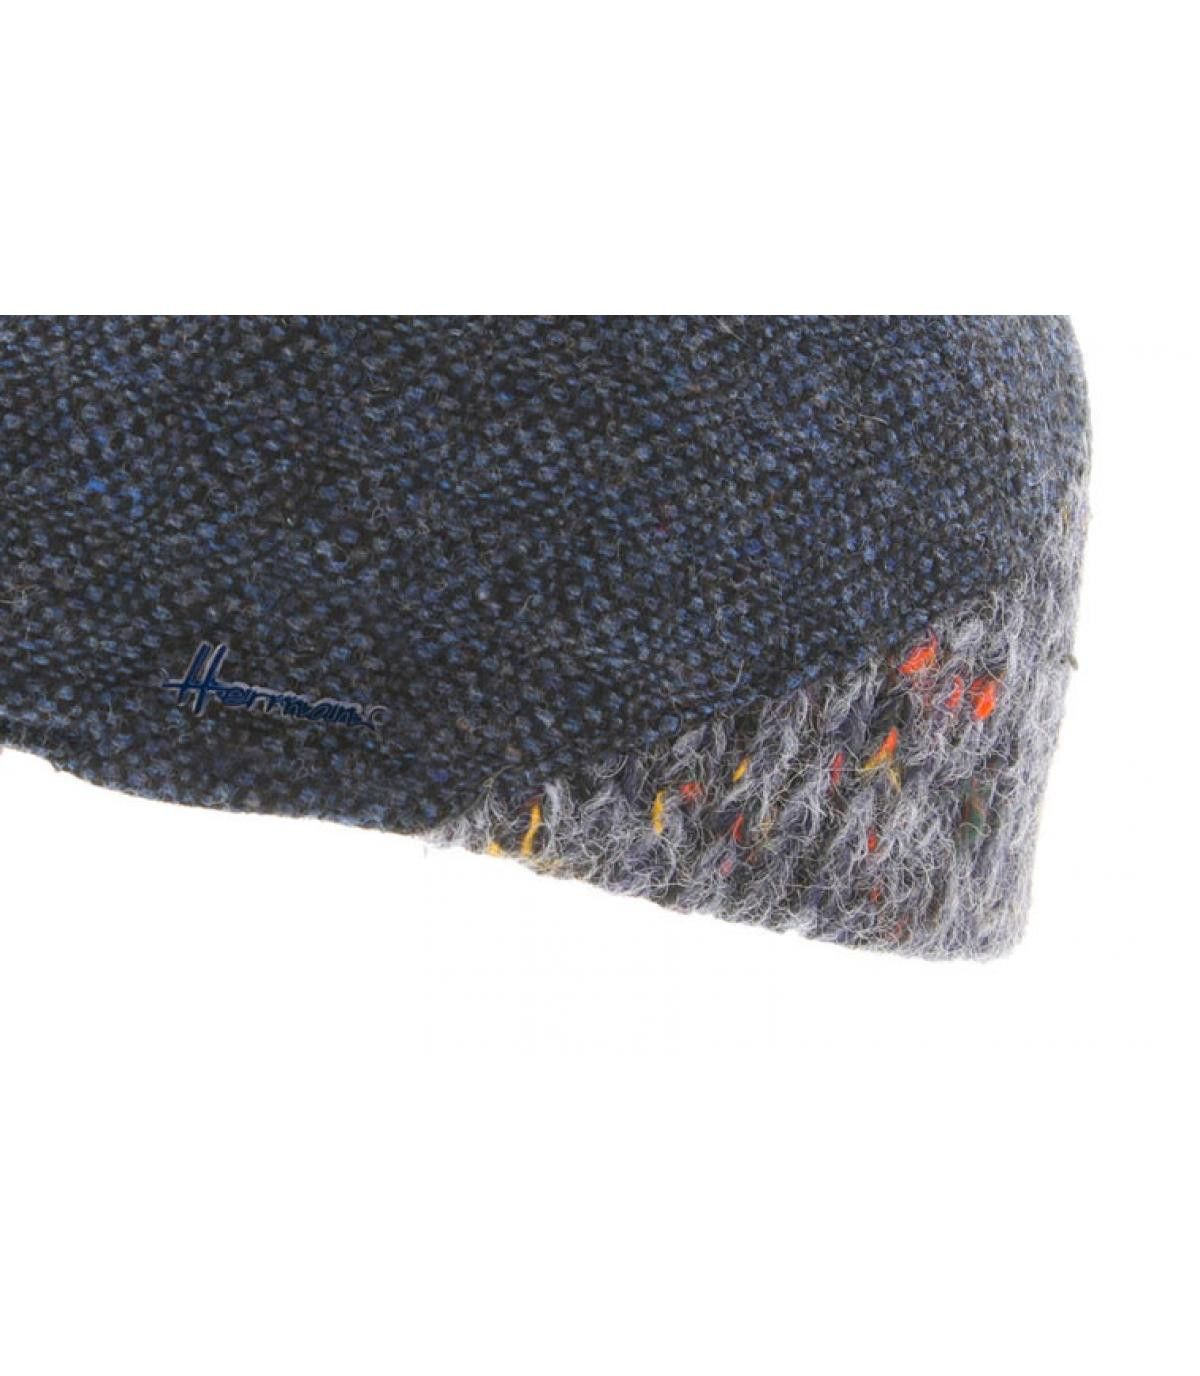 Details Range Wool blue - Abbildung 3